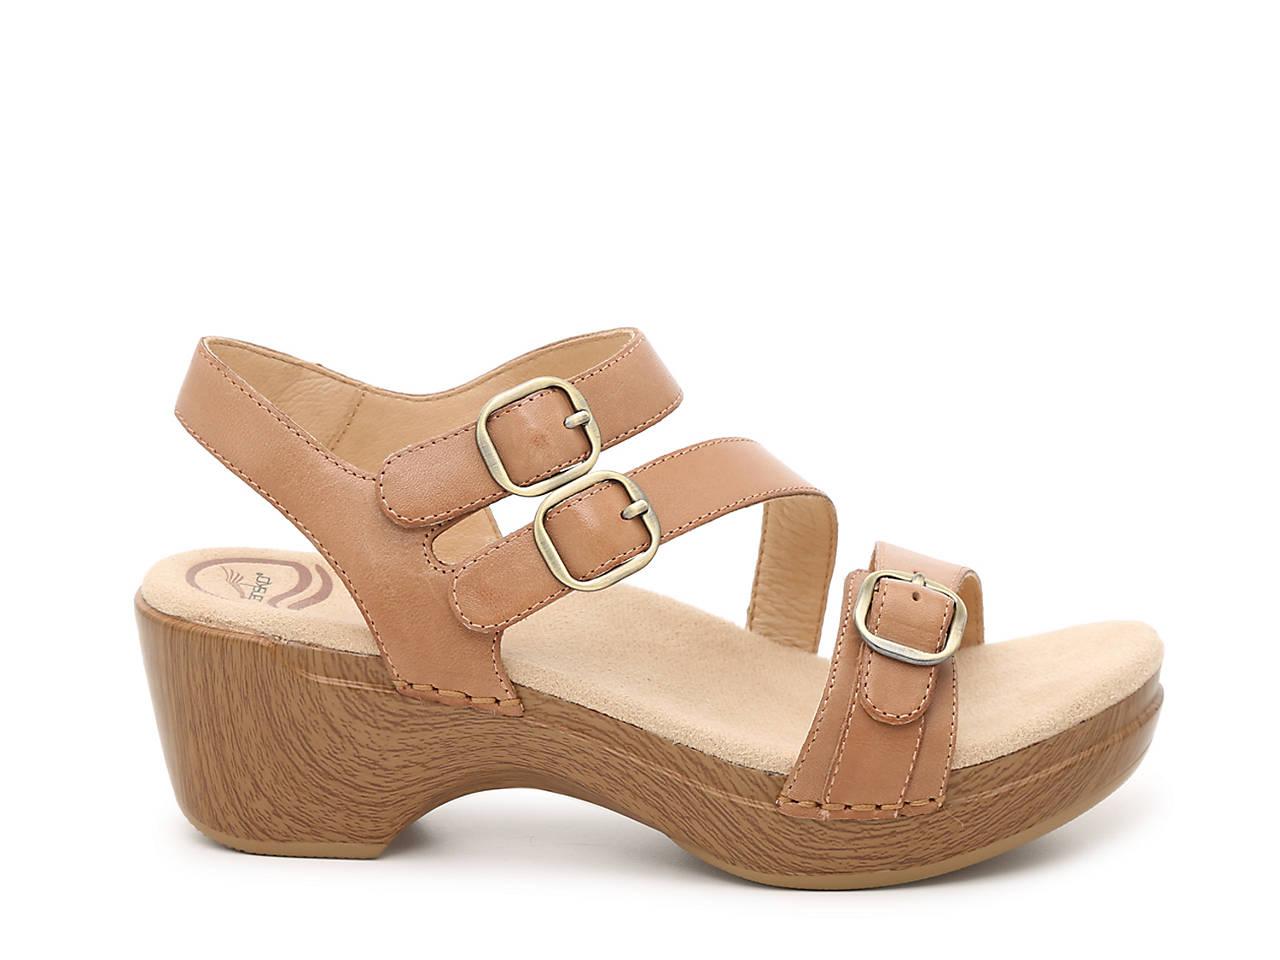 Dansko Sacha Platform Sandal Women's Shoes | DSW